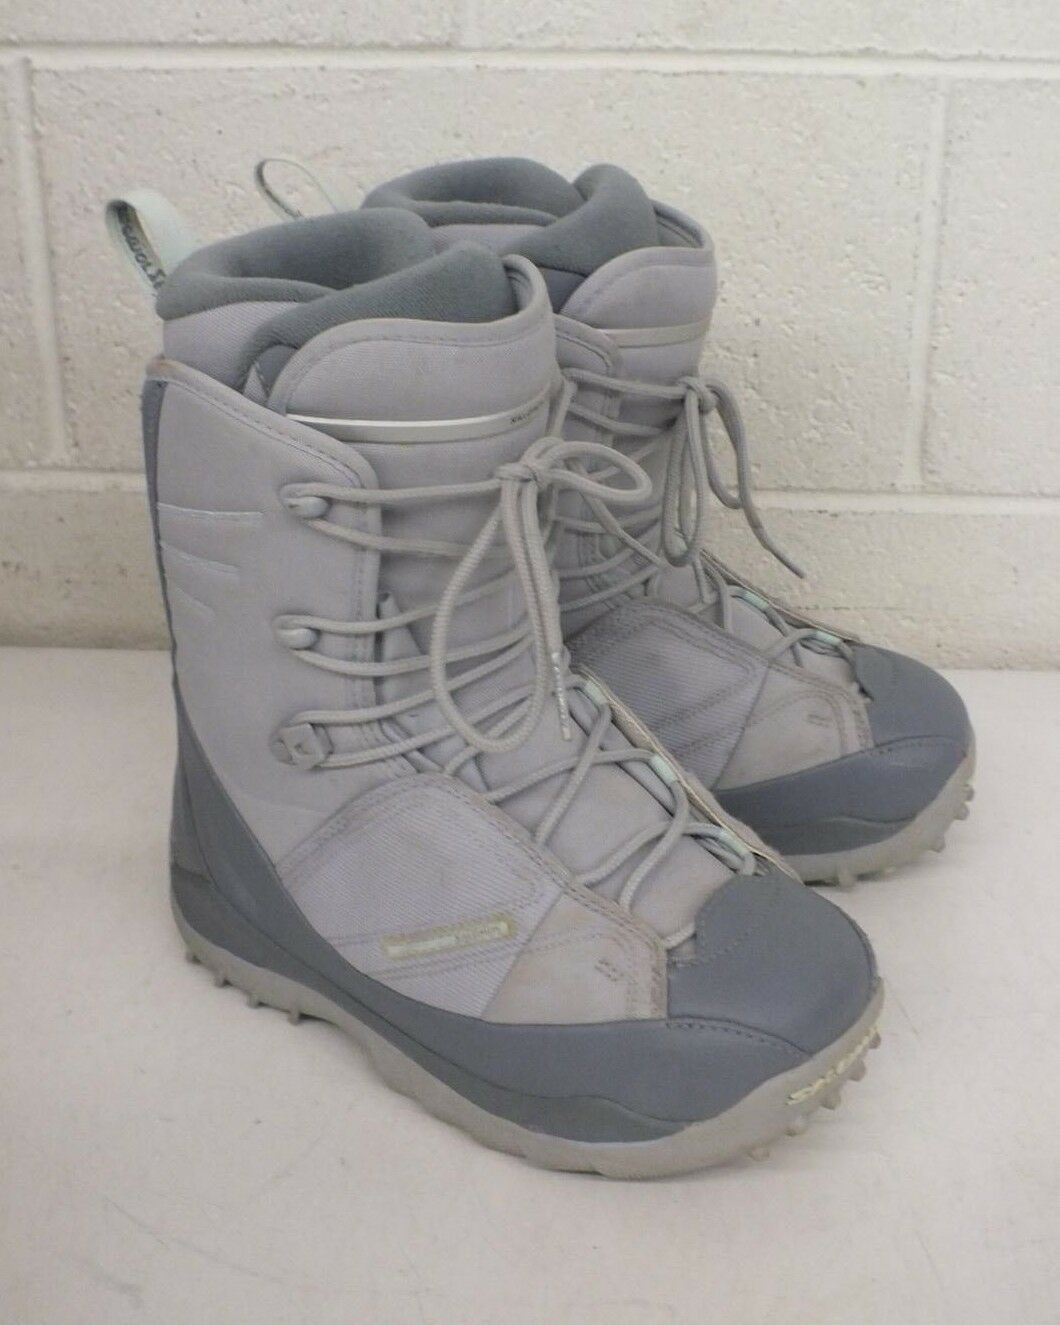 Salomon  Halitan High-Quality All-Mountain Snowboarding Boots US Women's 7 39  online retailers